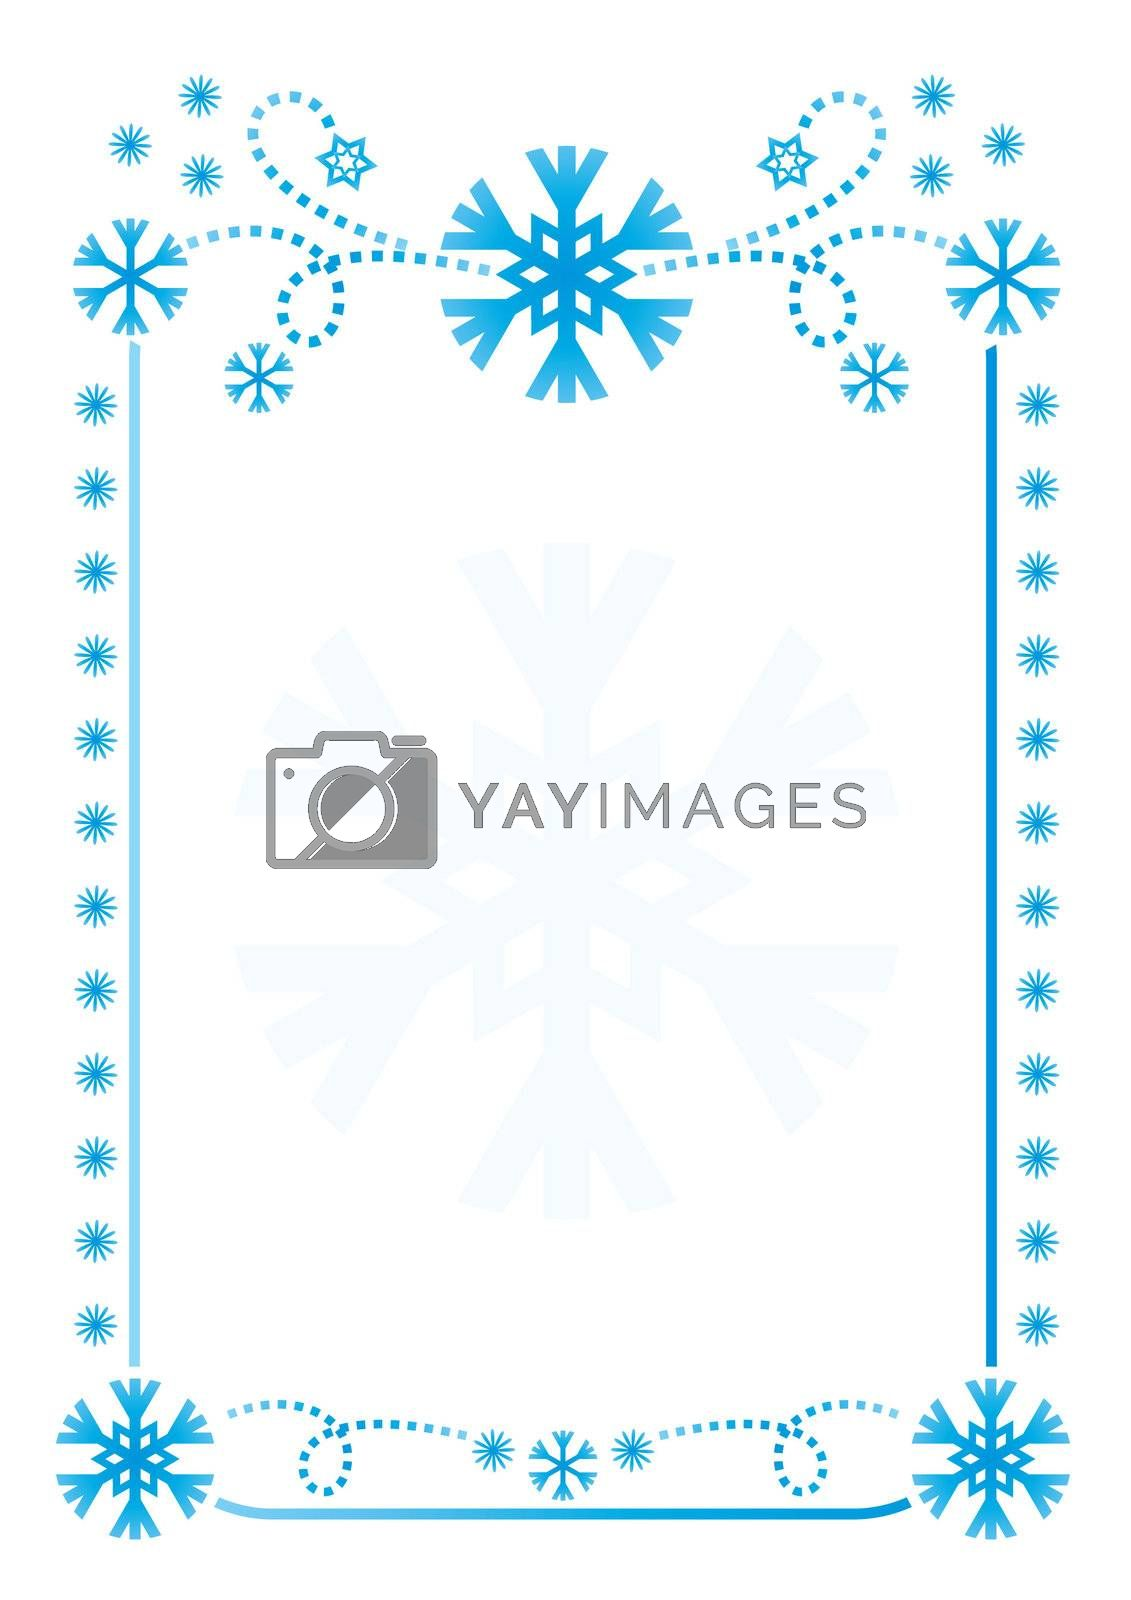 snowflakes frame background. Vector illustration